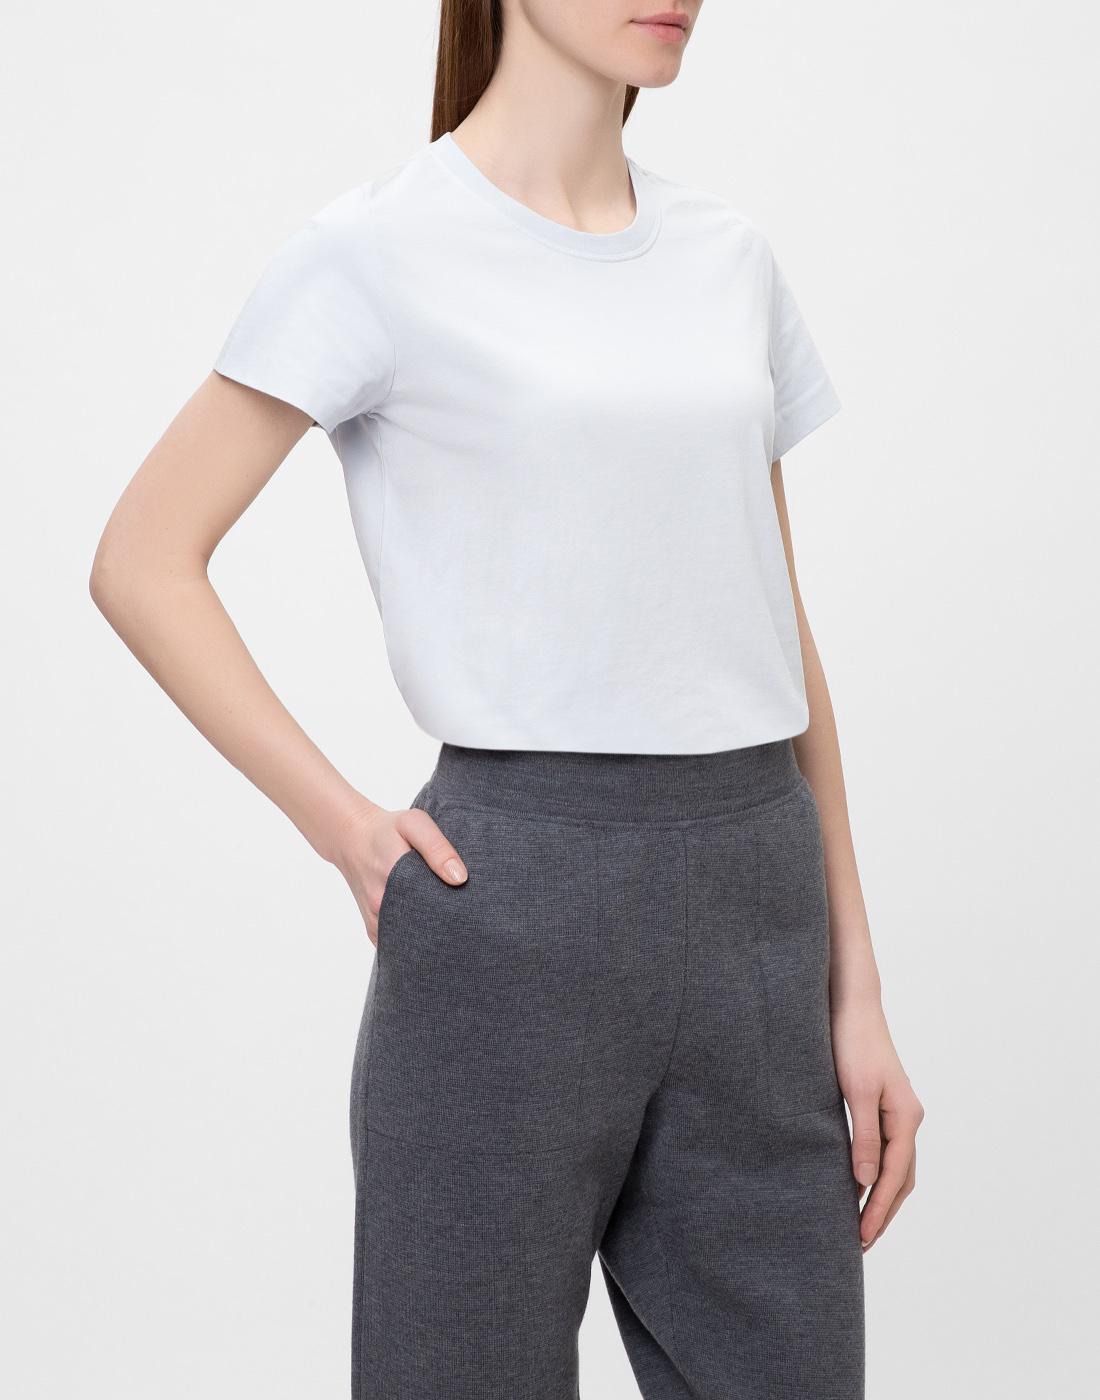 Женская голубая футболка  Dorothee Schumacher S623001/801-3